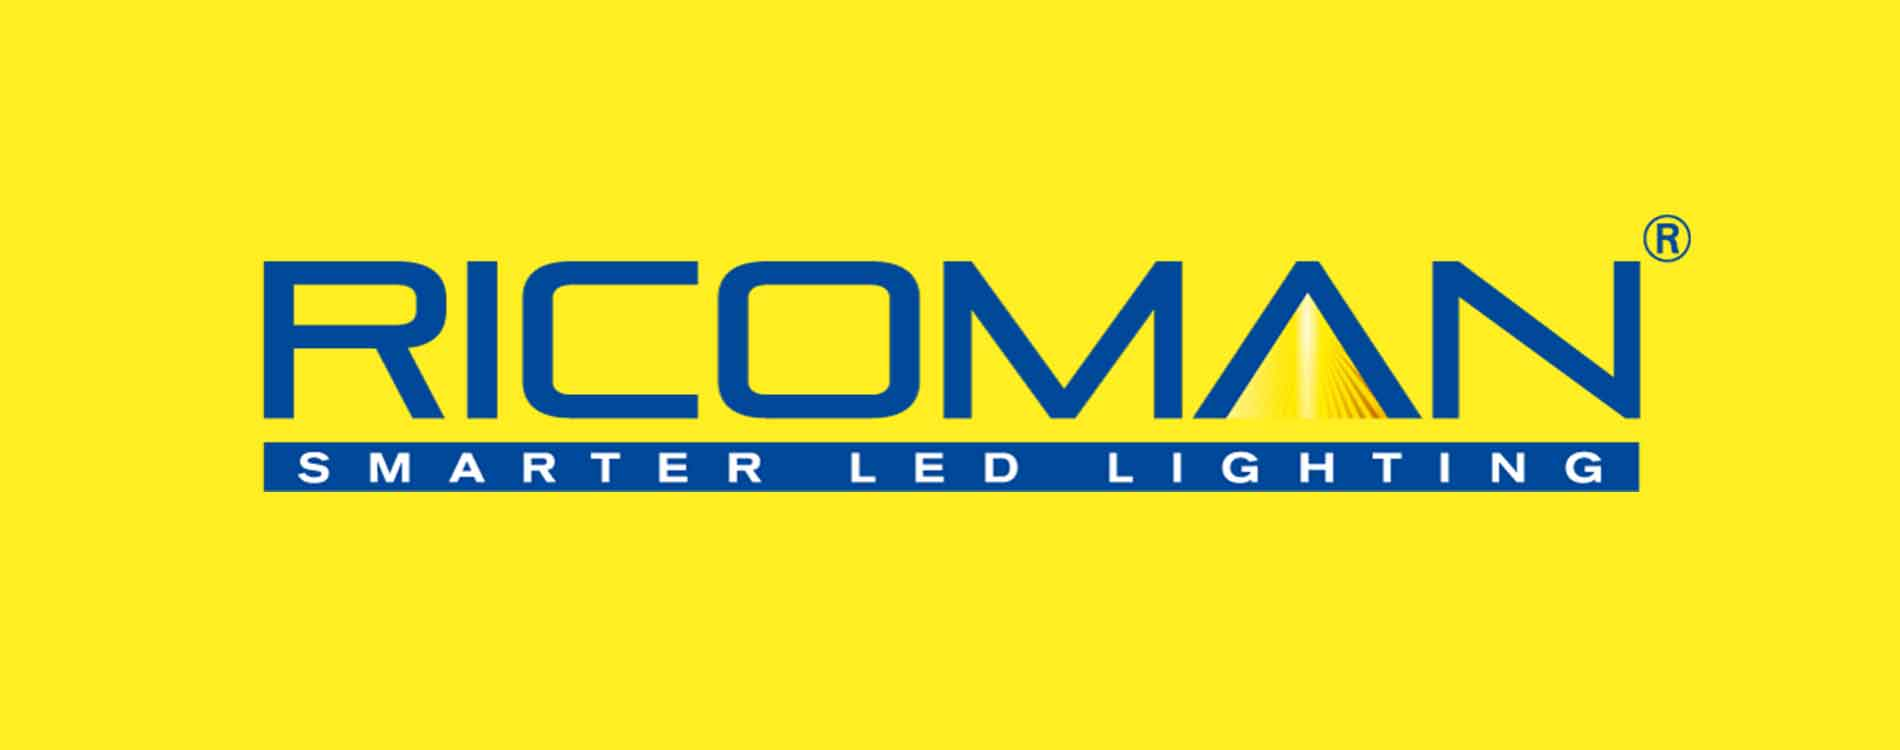 Ricoman Smarter LED Lighting Thumbnail